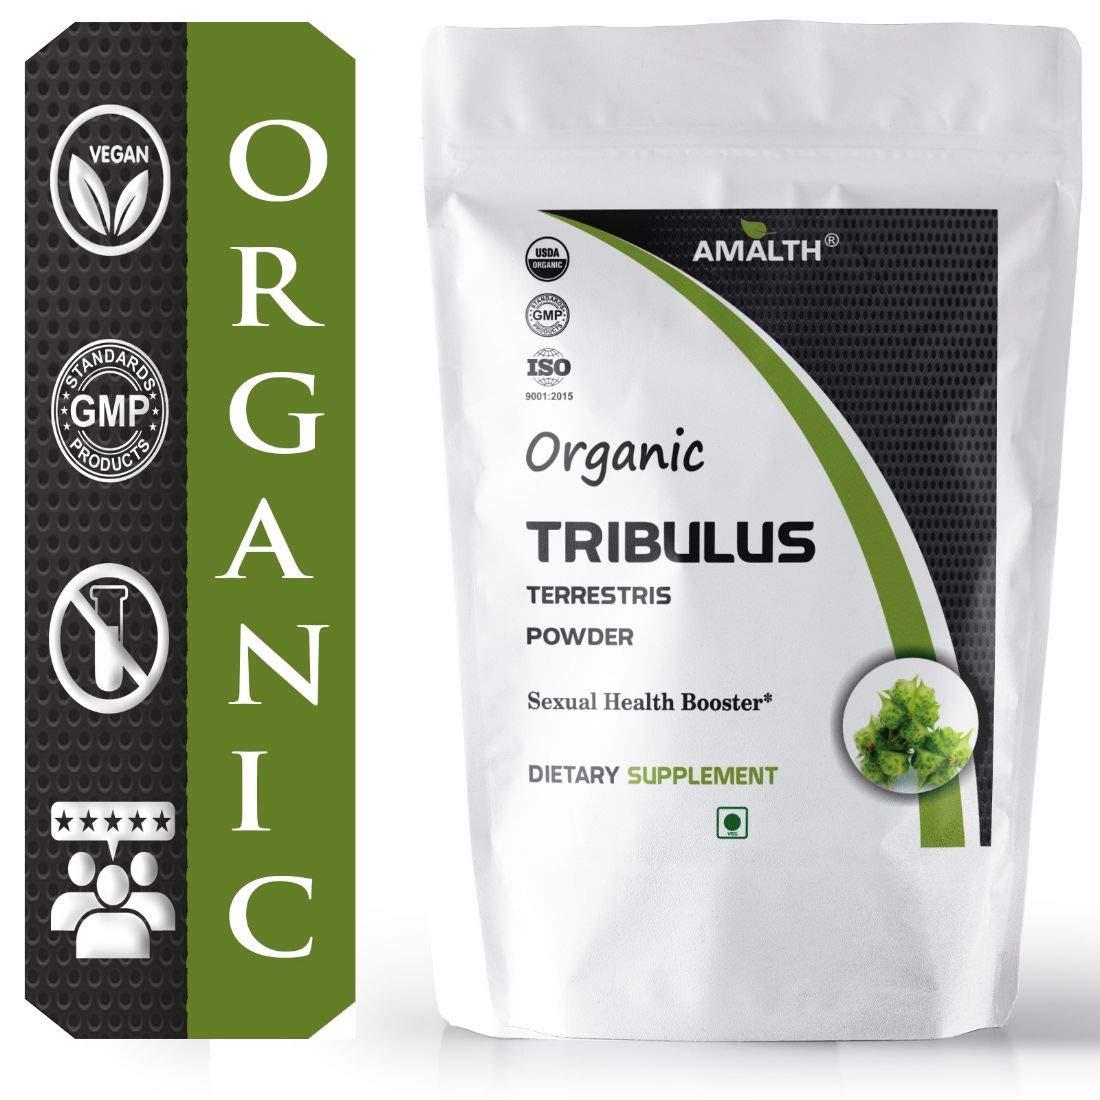 AMALTH USDA Certified Organic Tribulus Terrestris Powder 2.2 lb / 1kg for Strong Body